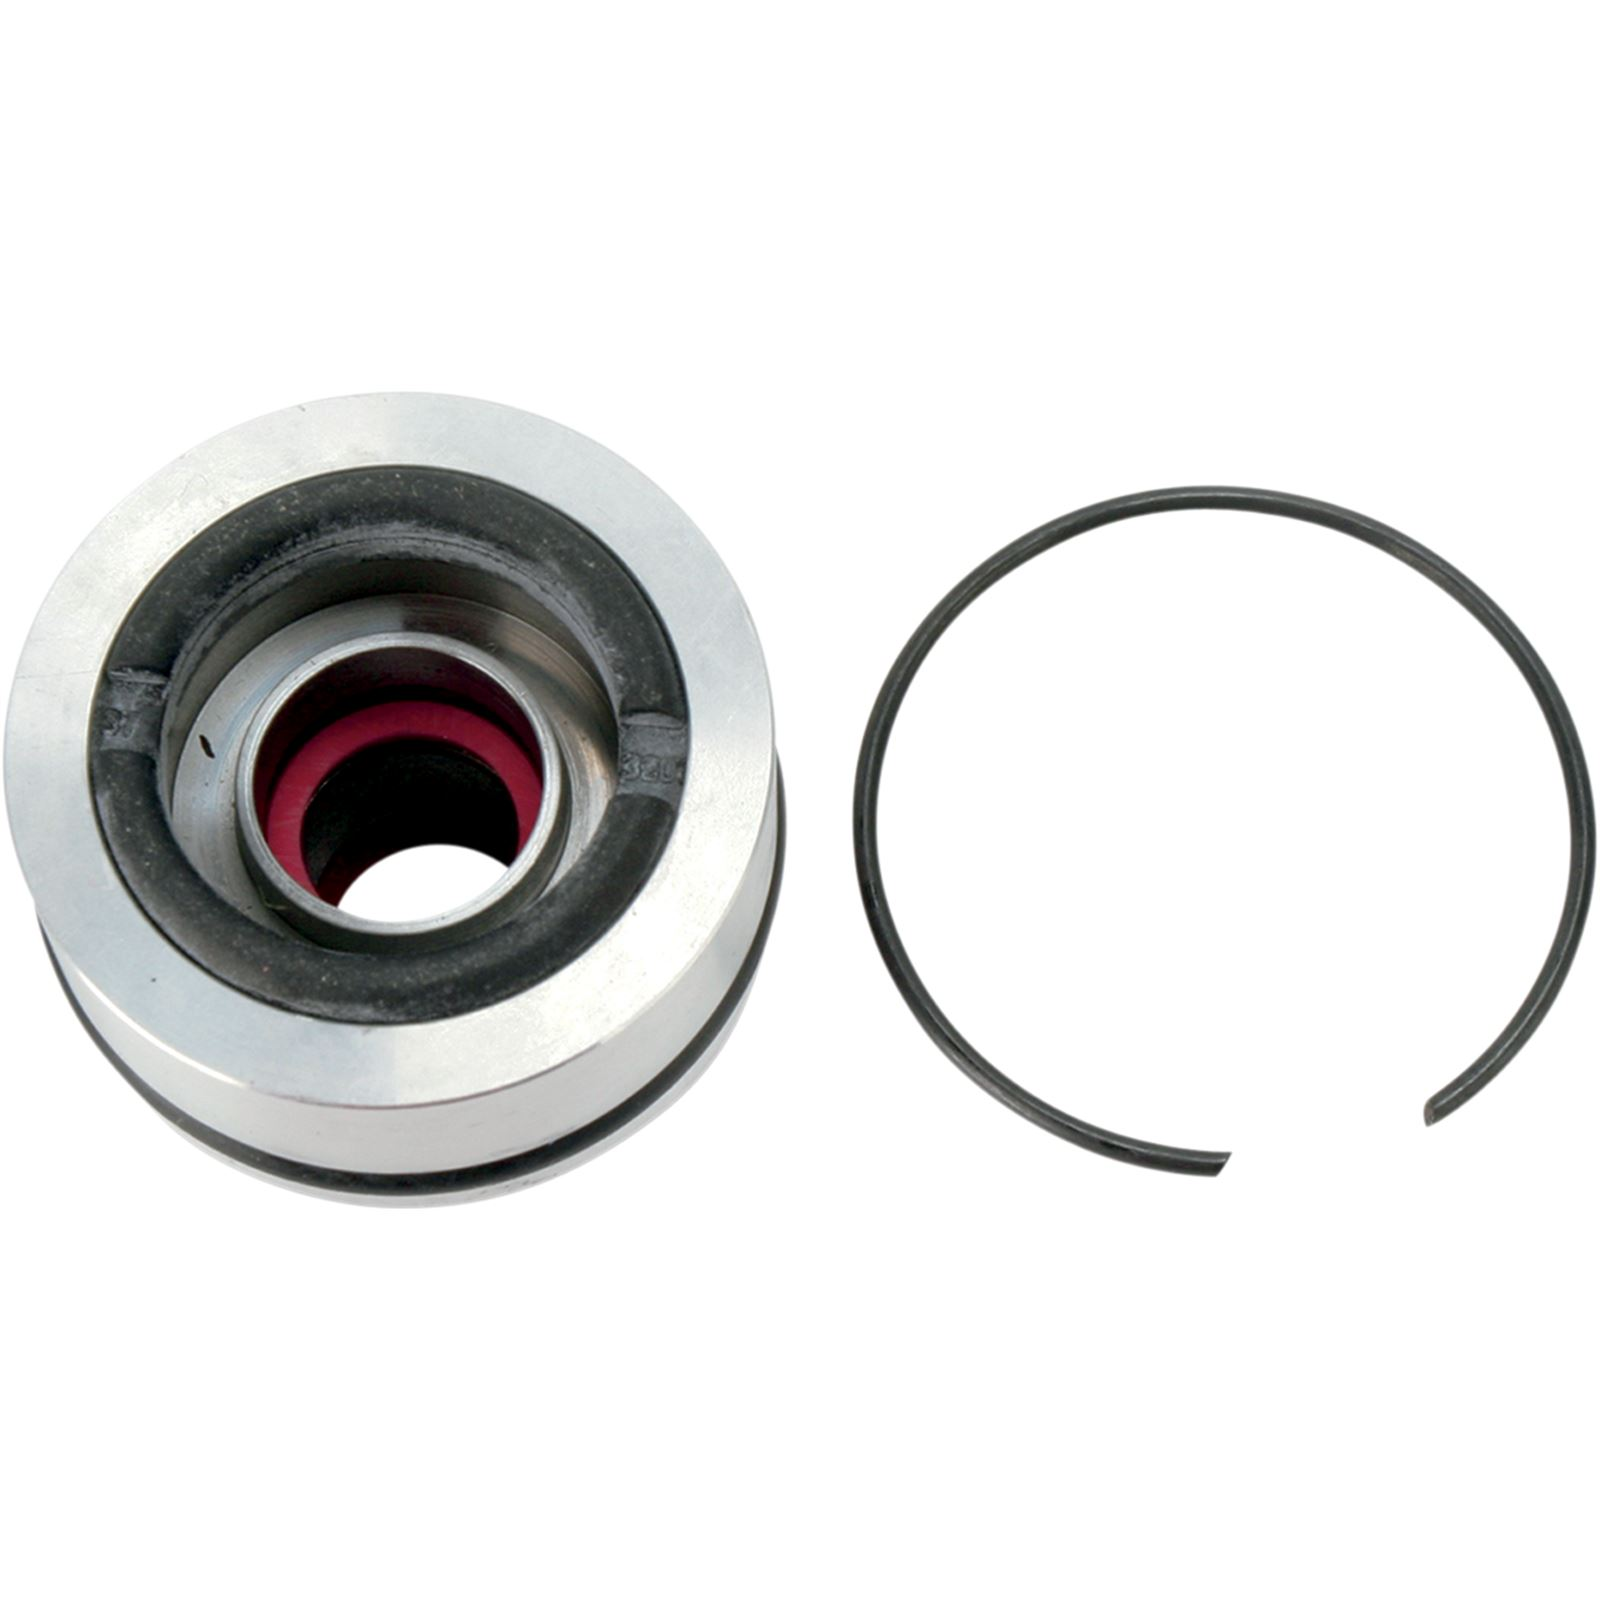 Moose Racing Shock Seal Head - 16 mm ID x 50 mm OD